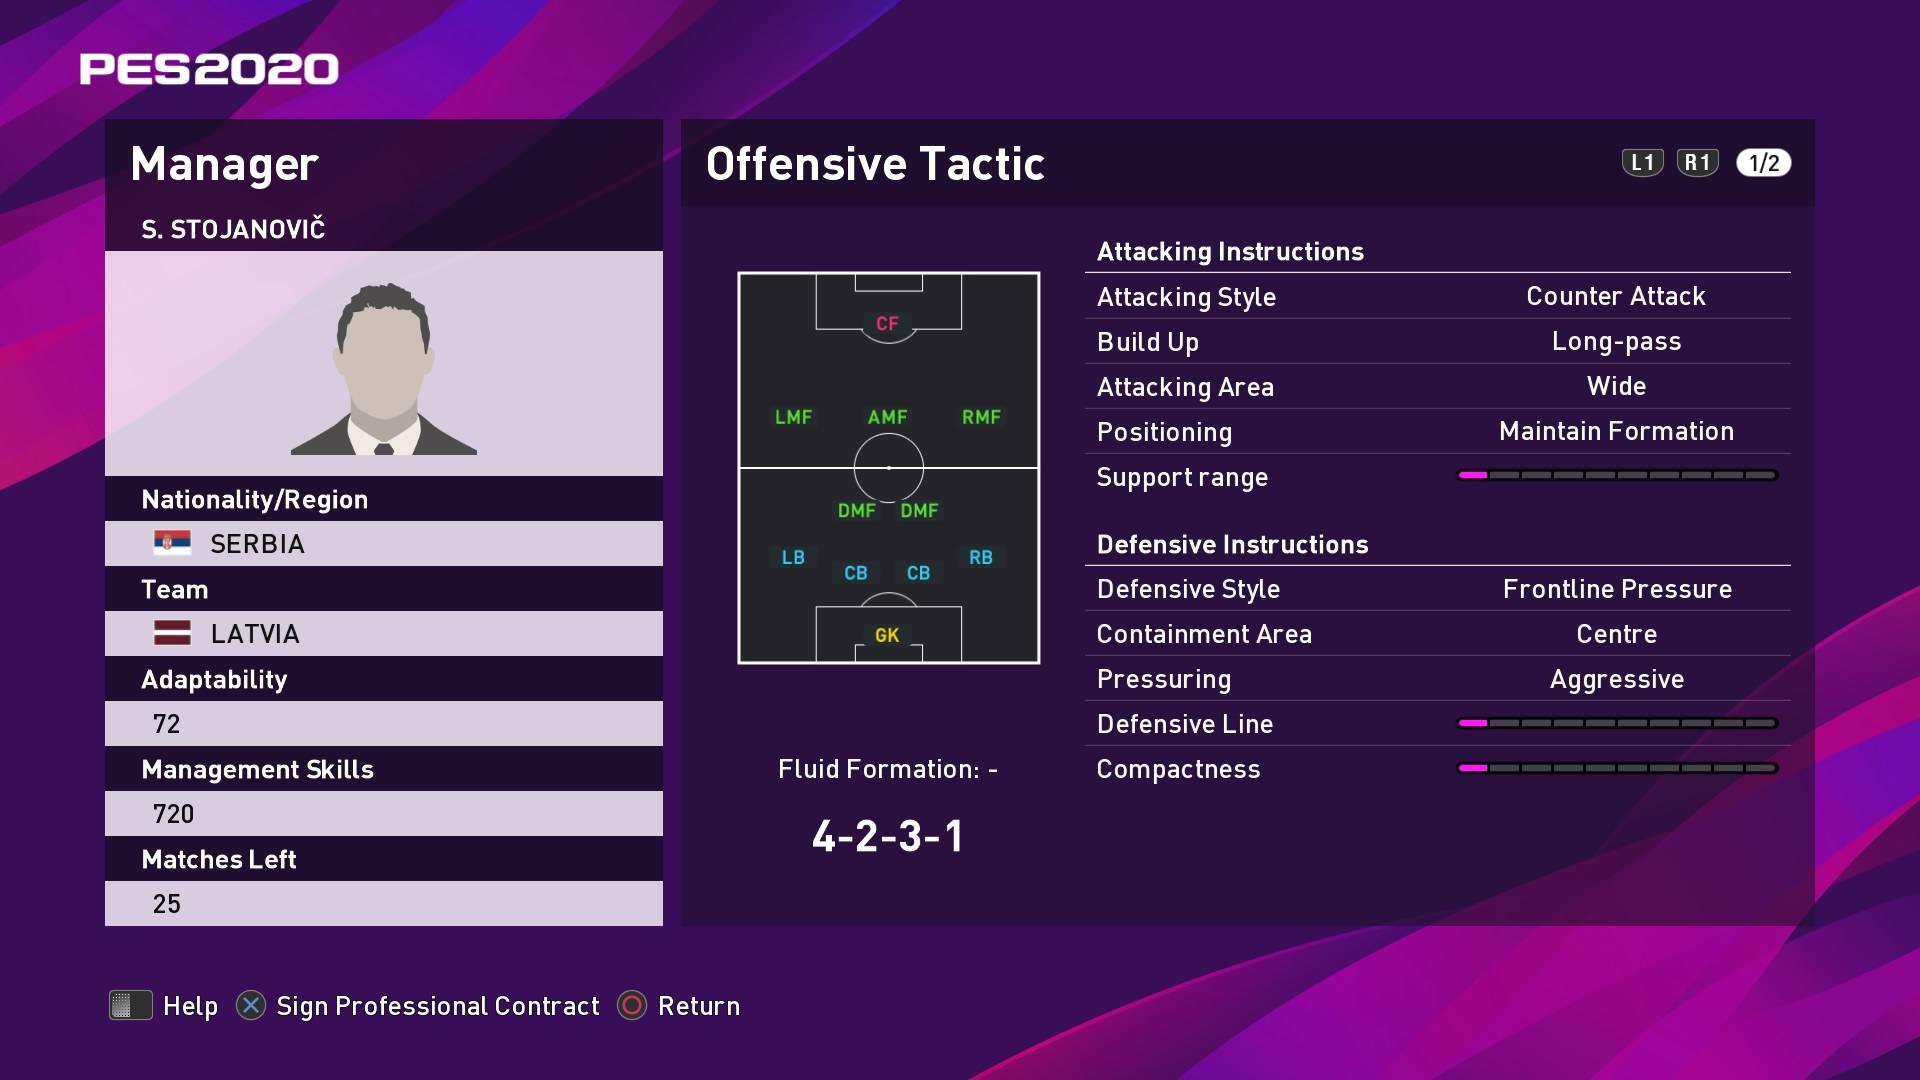 S. Stojanovic (Slaviša Stojanovič) Offensive Tactic in PES 2020 myClub